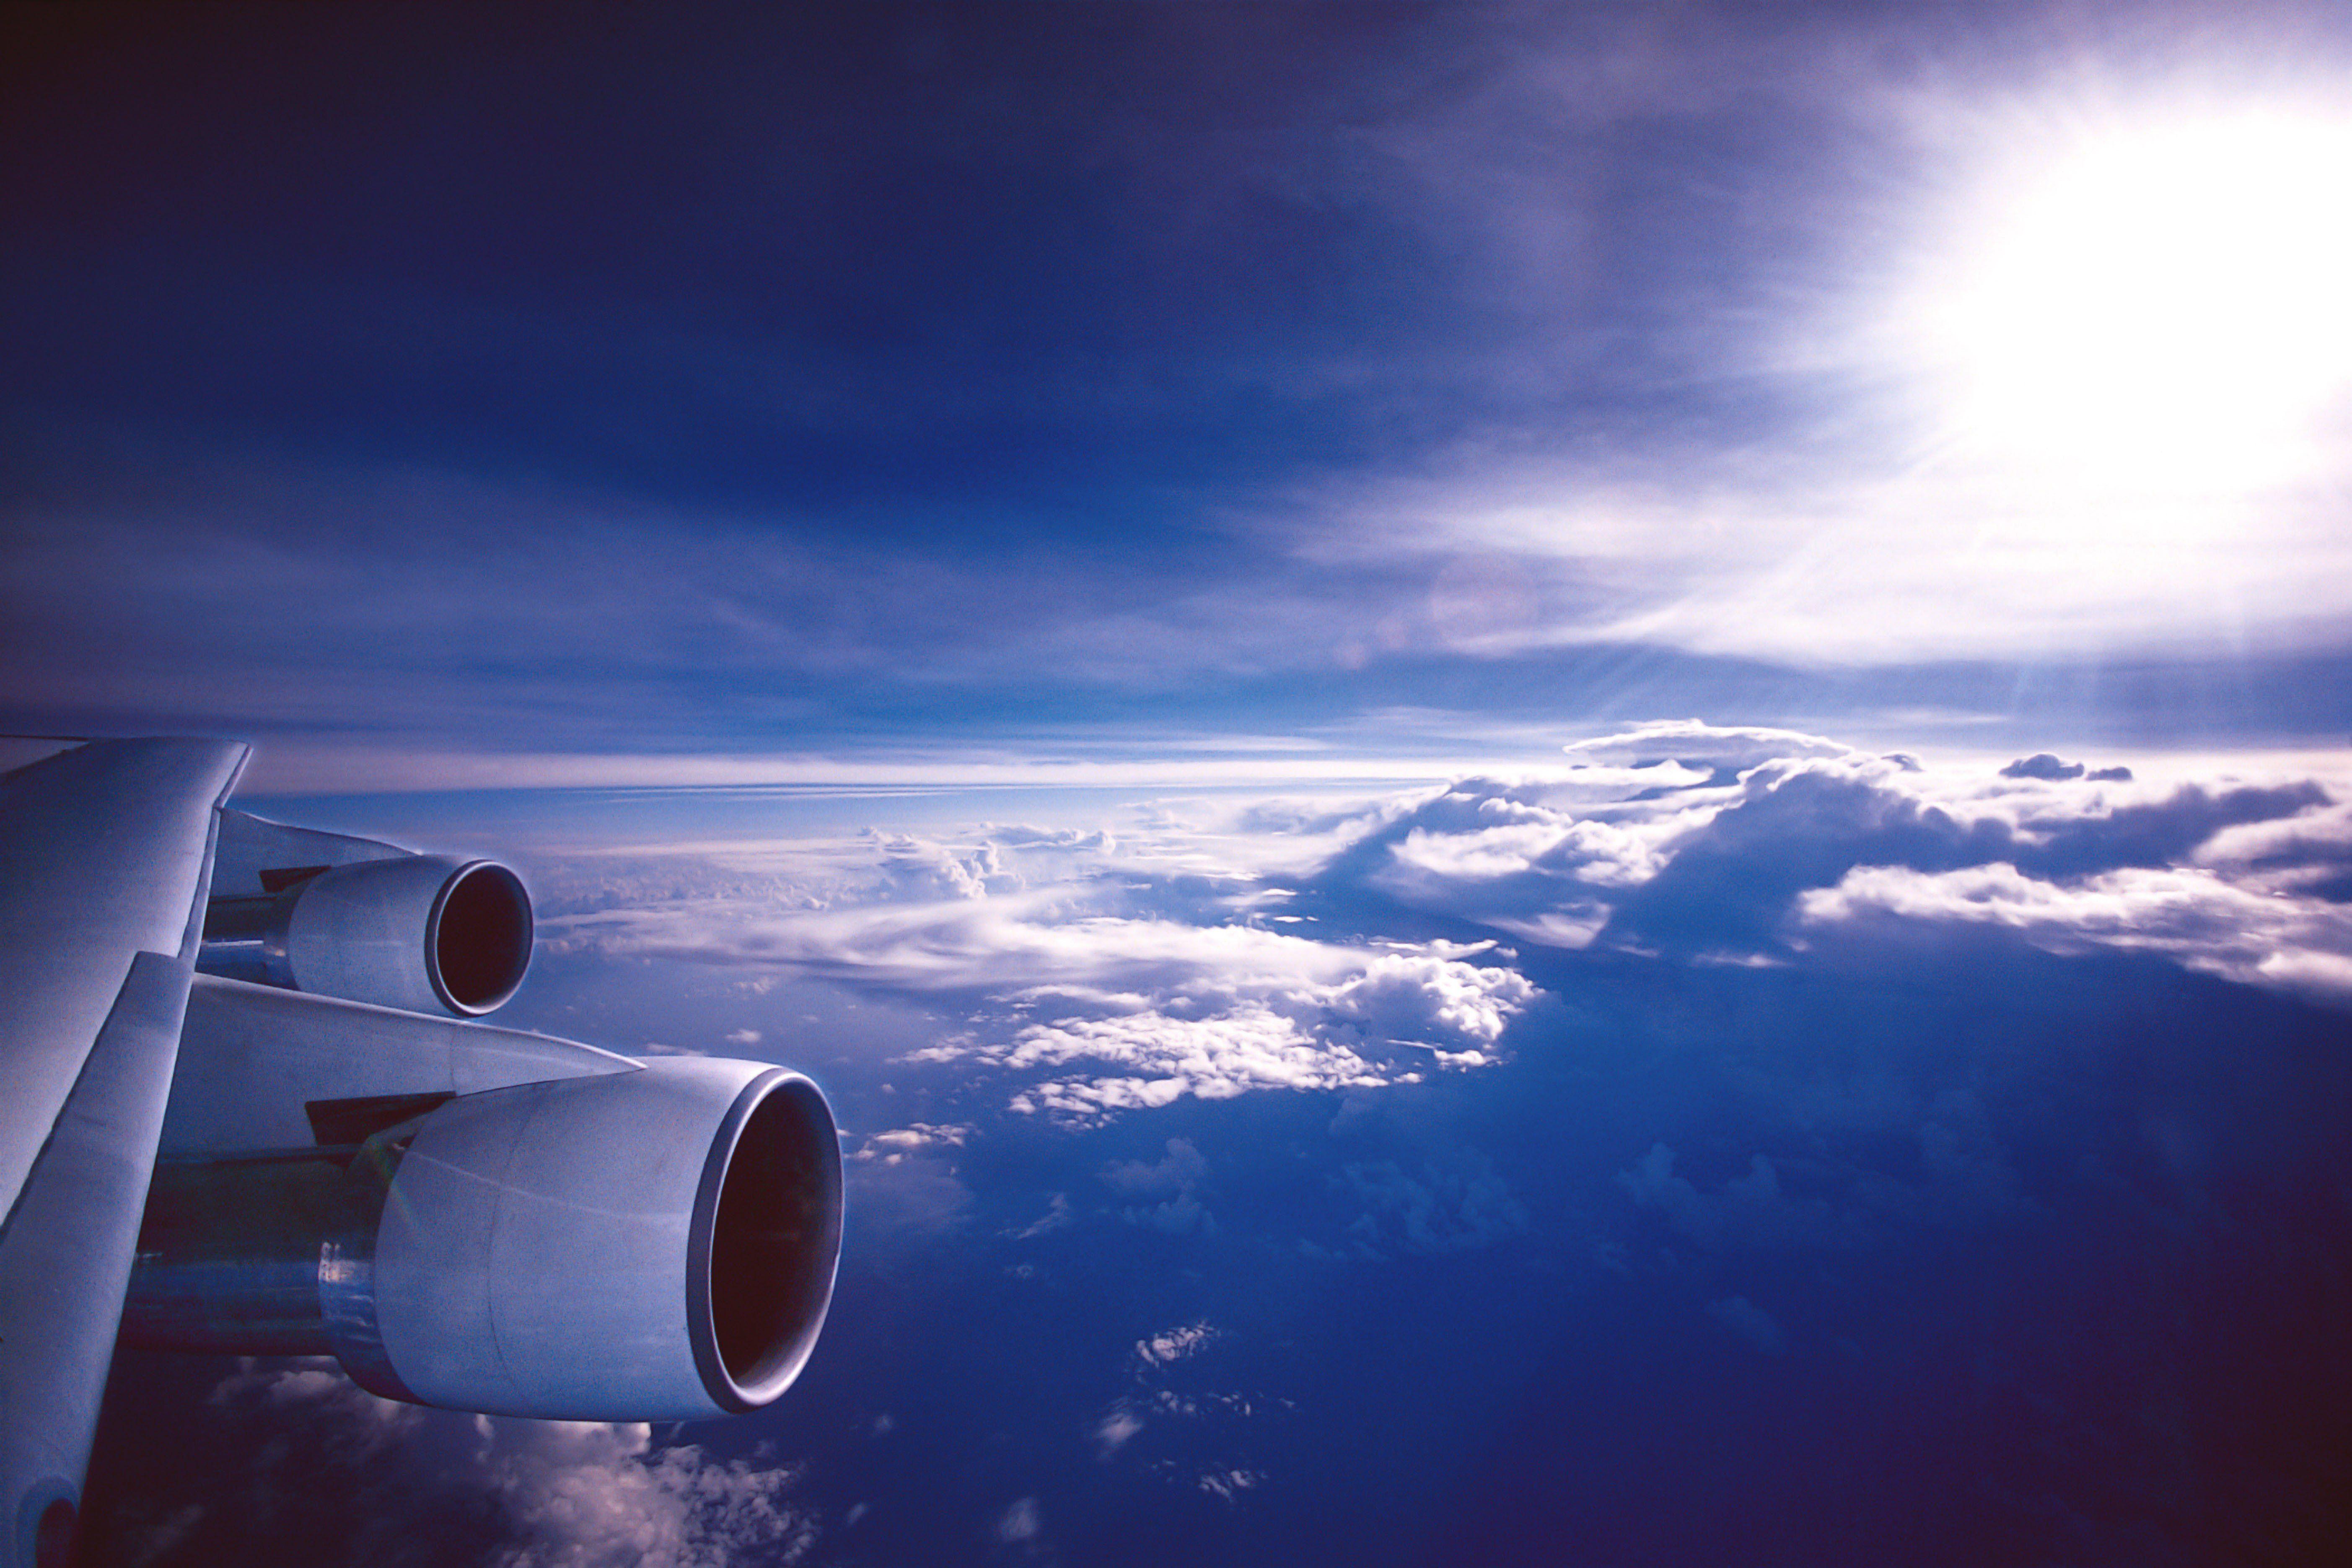 Ultra Hd K Aviation Wallpapers Hd Desktop Backgrounds X Cloud Wallpaper Wallpaper Landscape Wallpaper